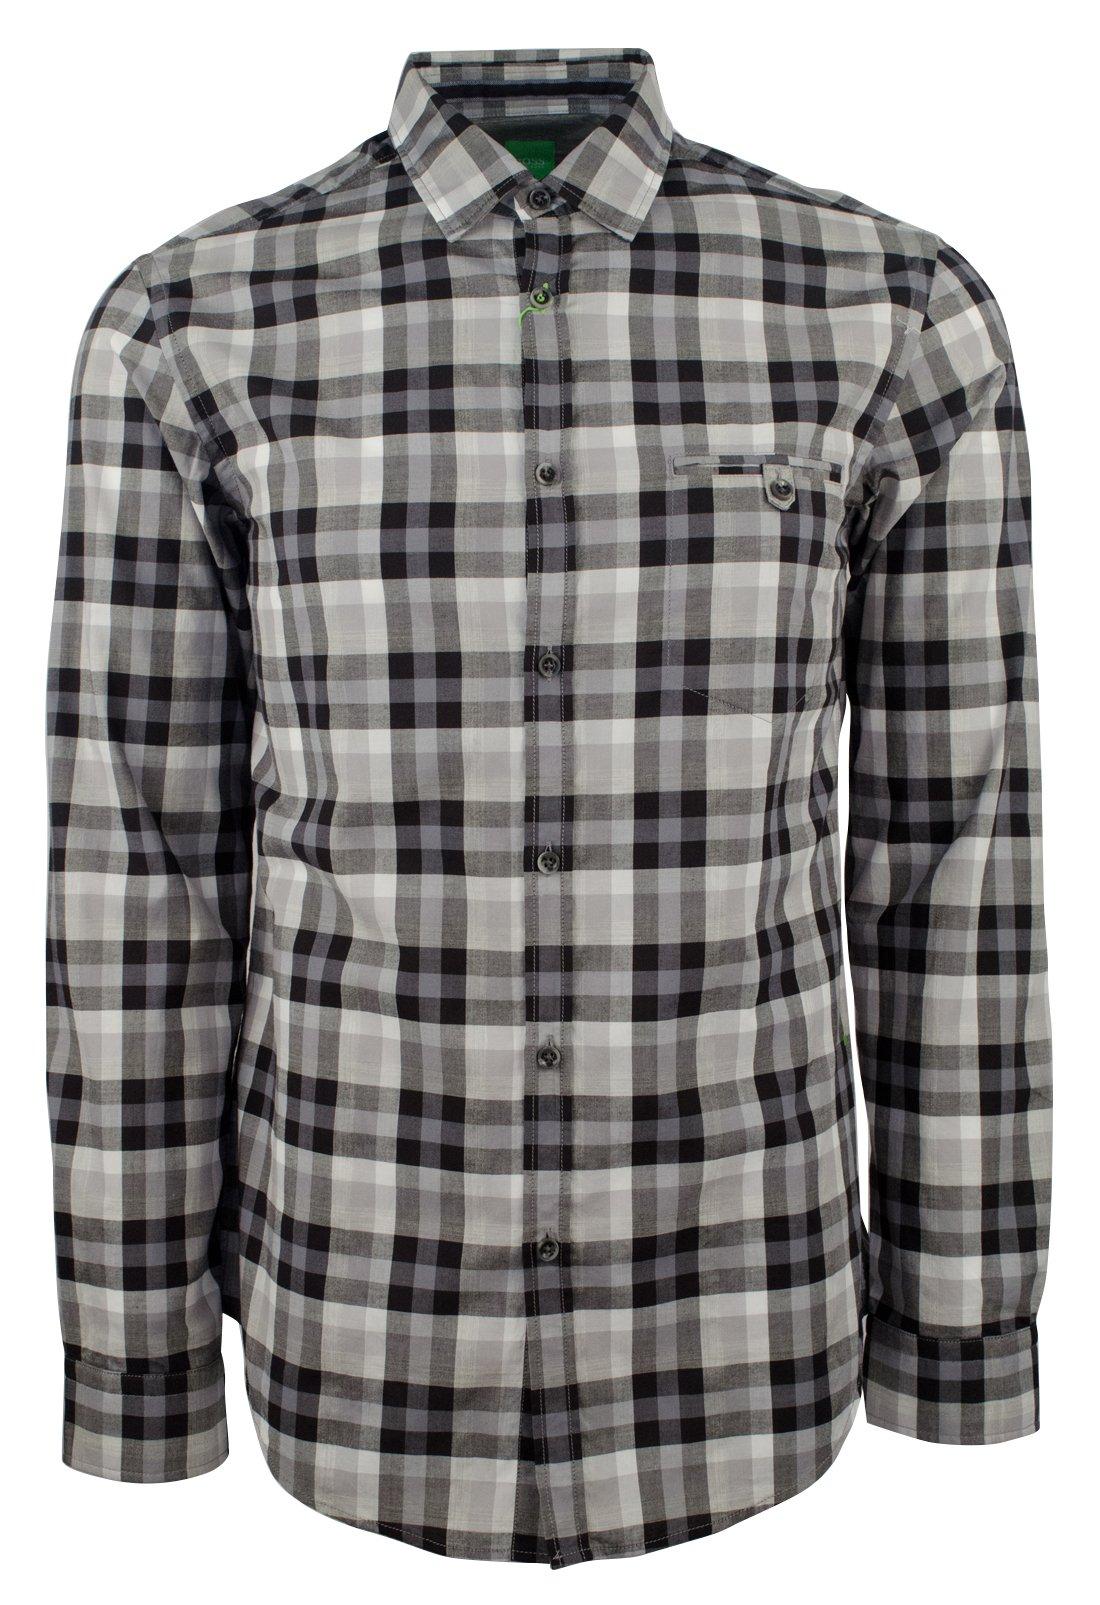 Hugo Boss Men's Green Label Blumas Slim-Fit Checked Sportshirt-BG-M